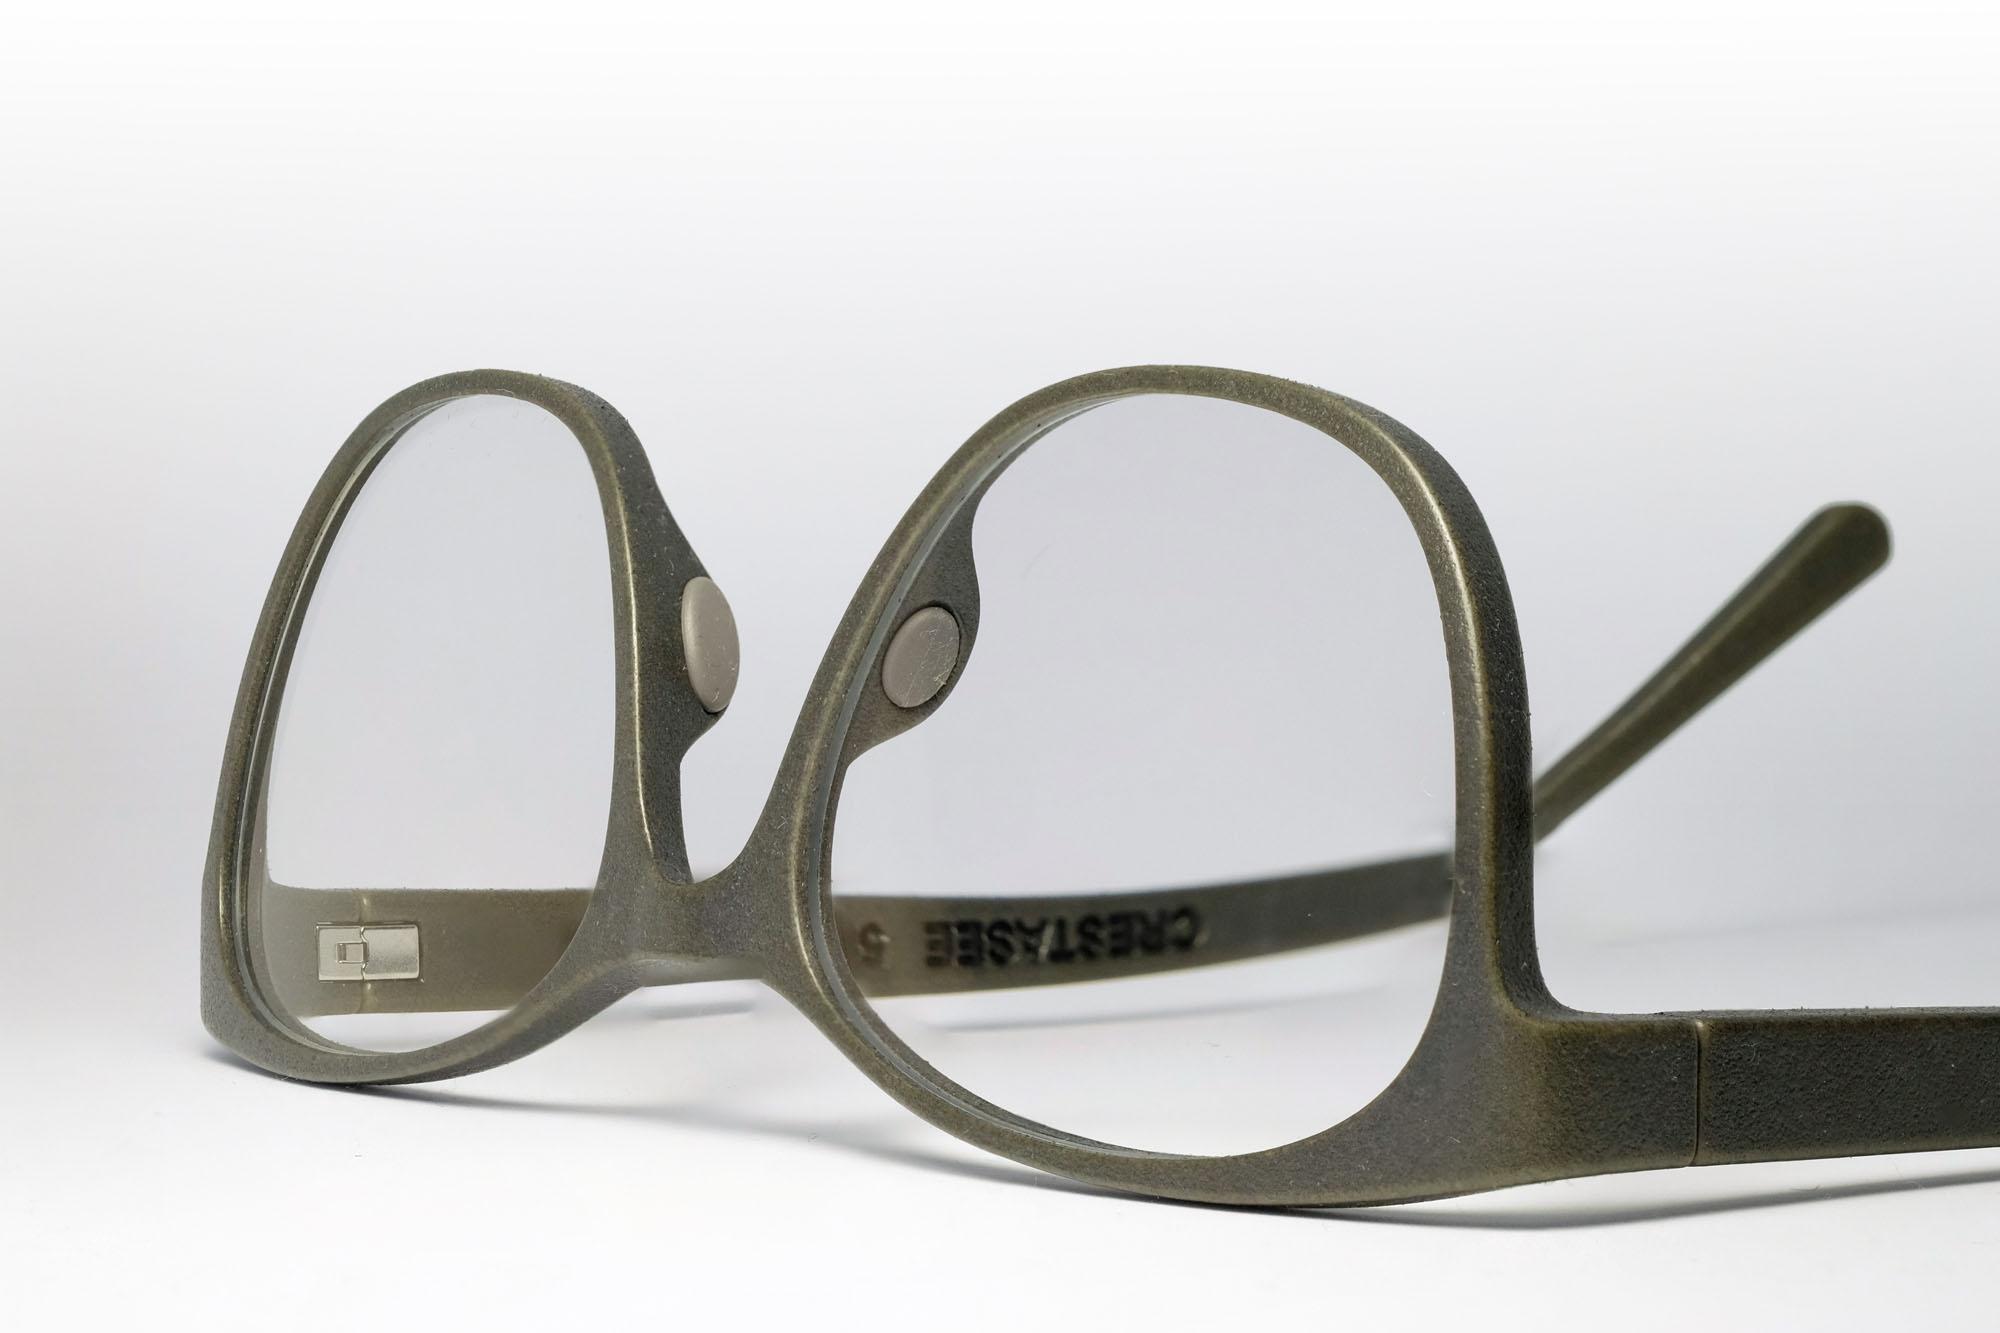 3D-looks - Crestasee